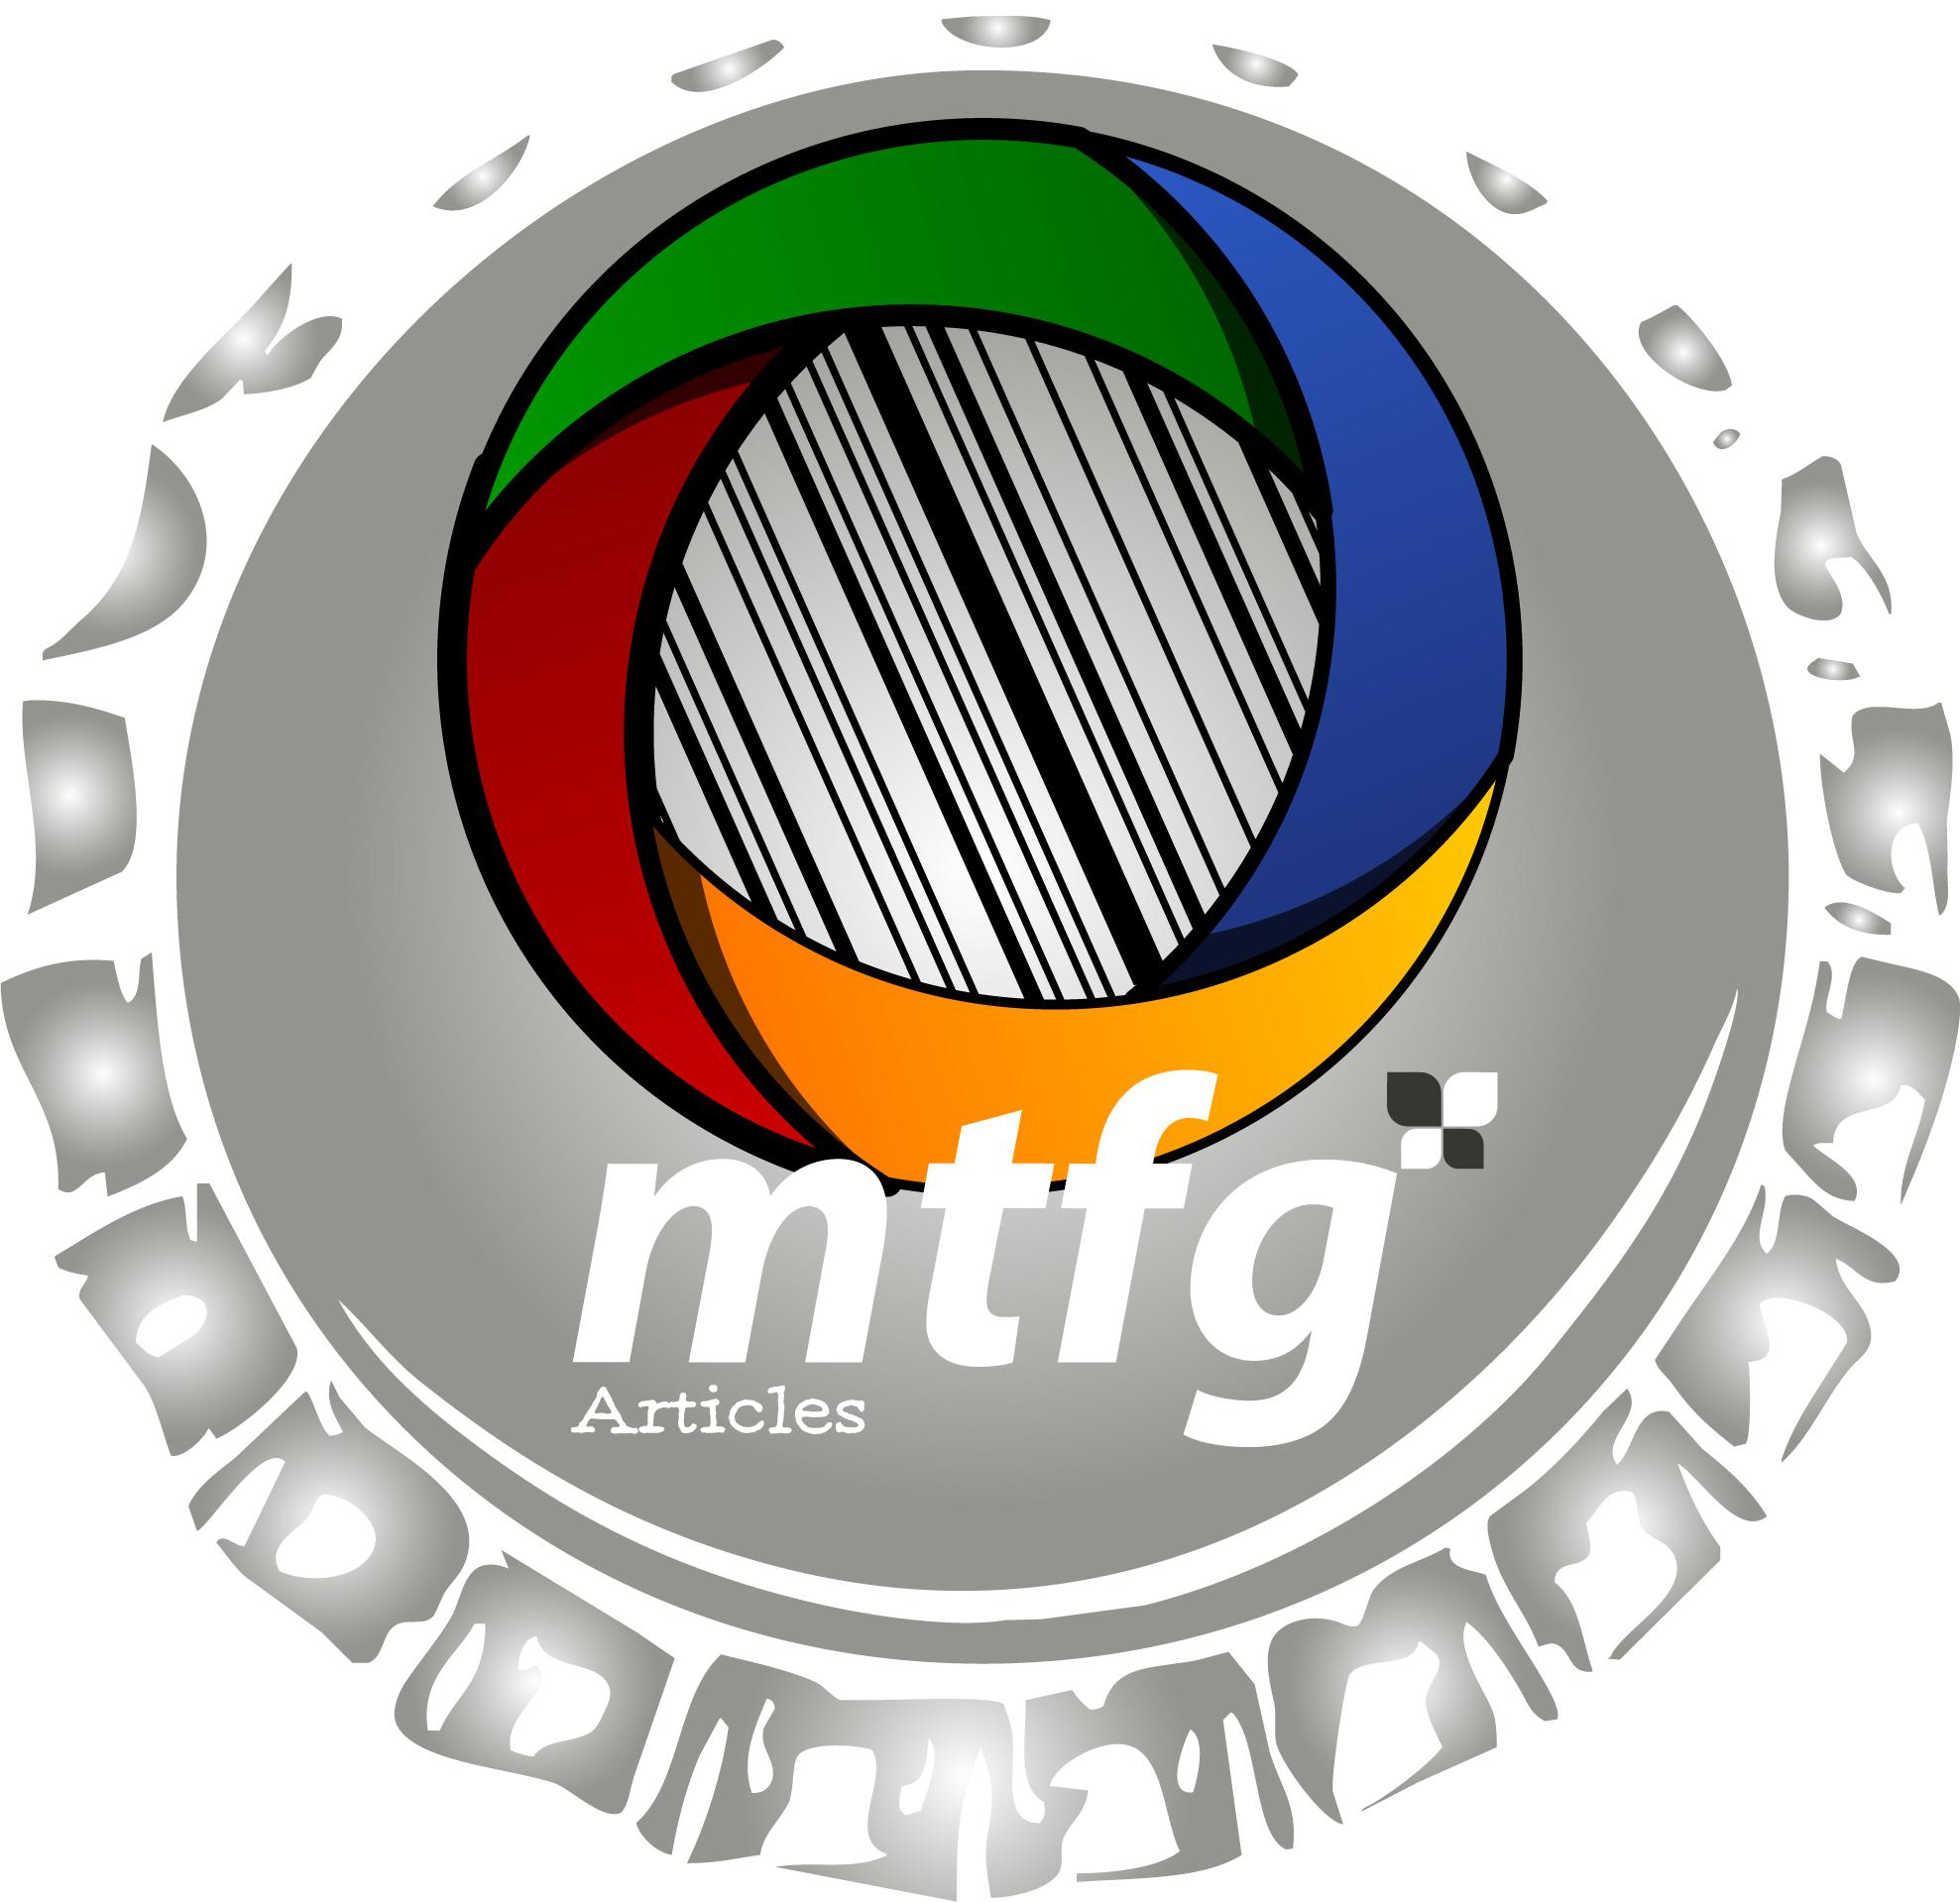 MTFG Articles